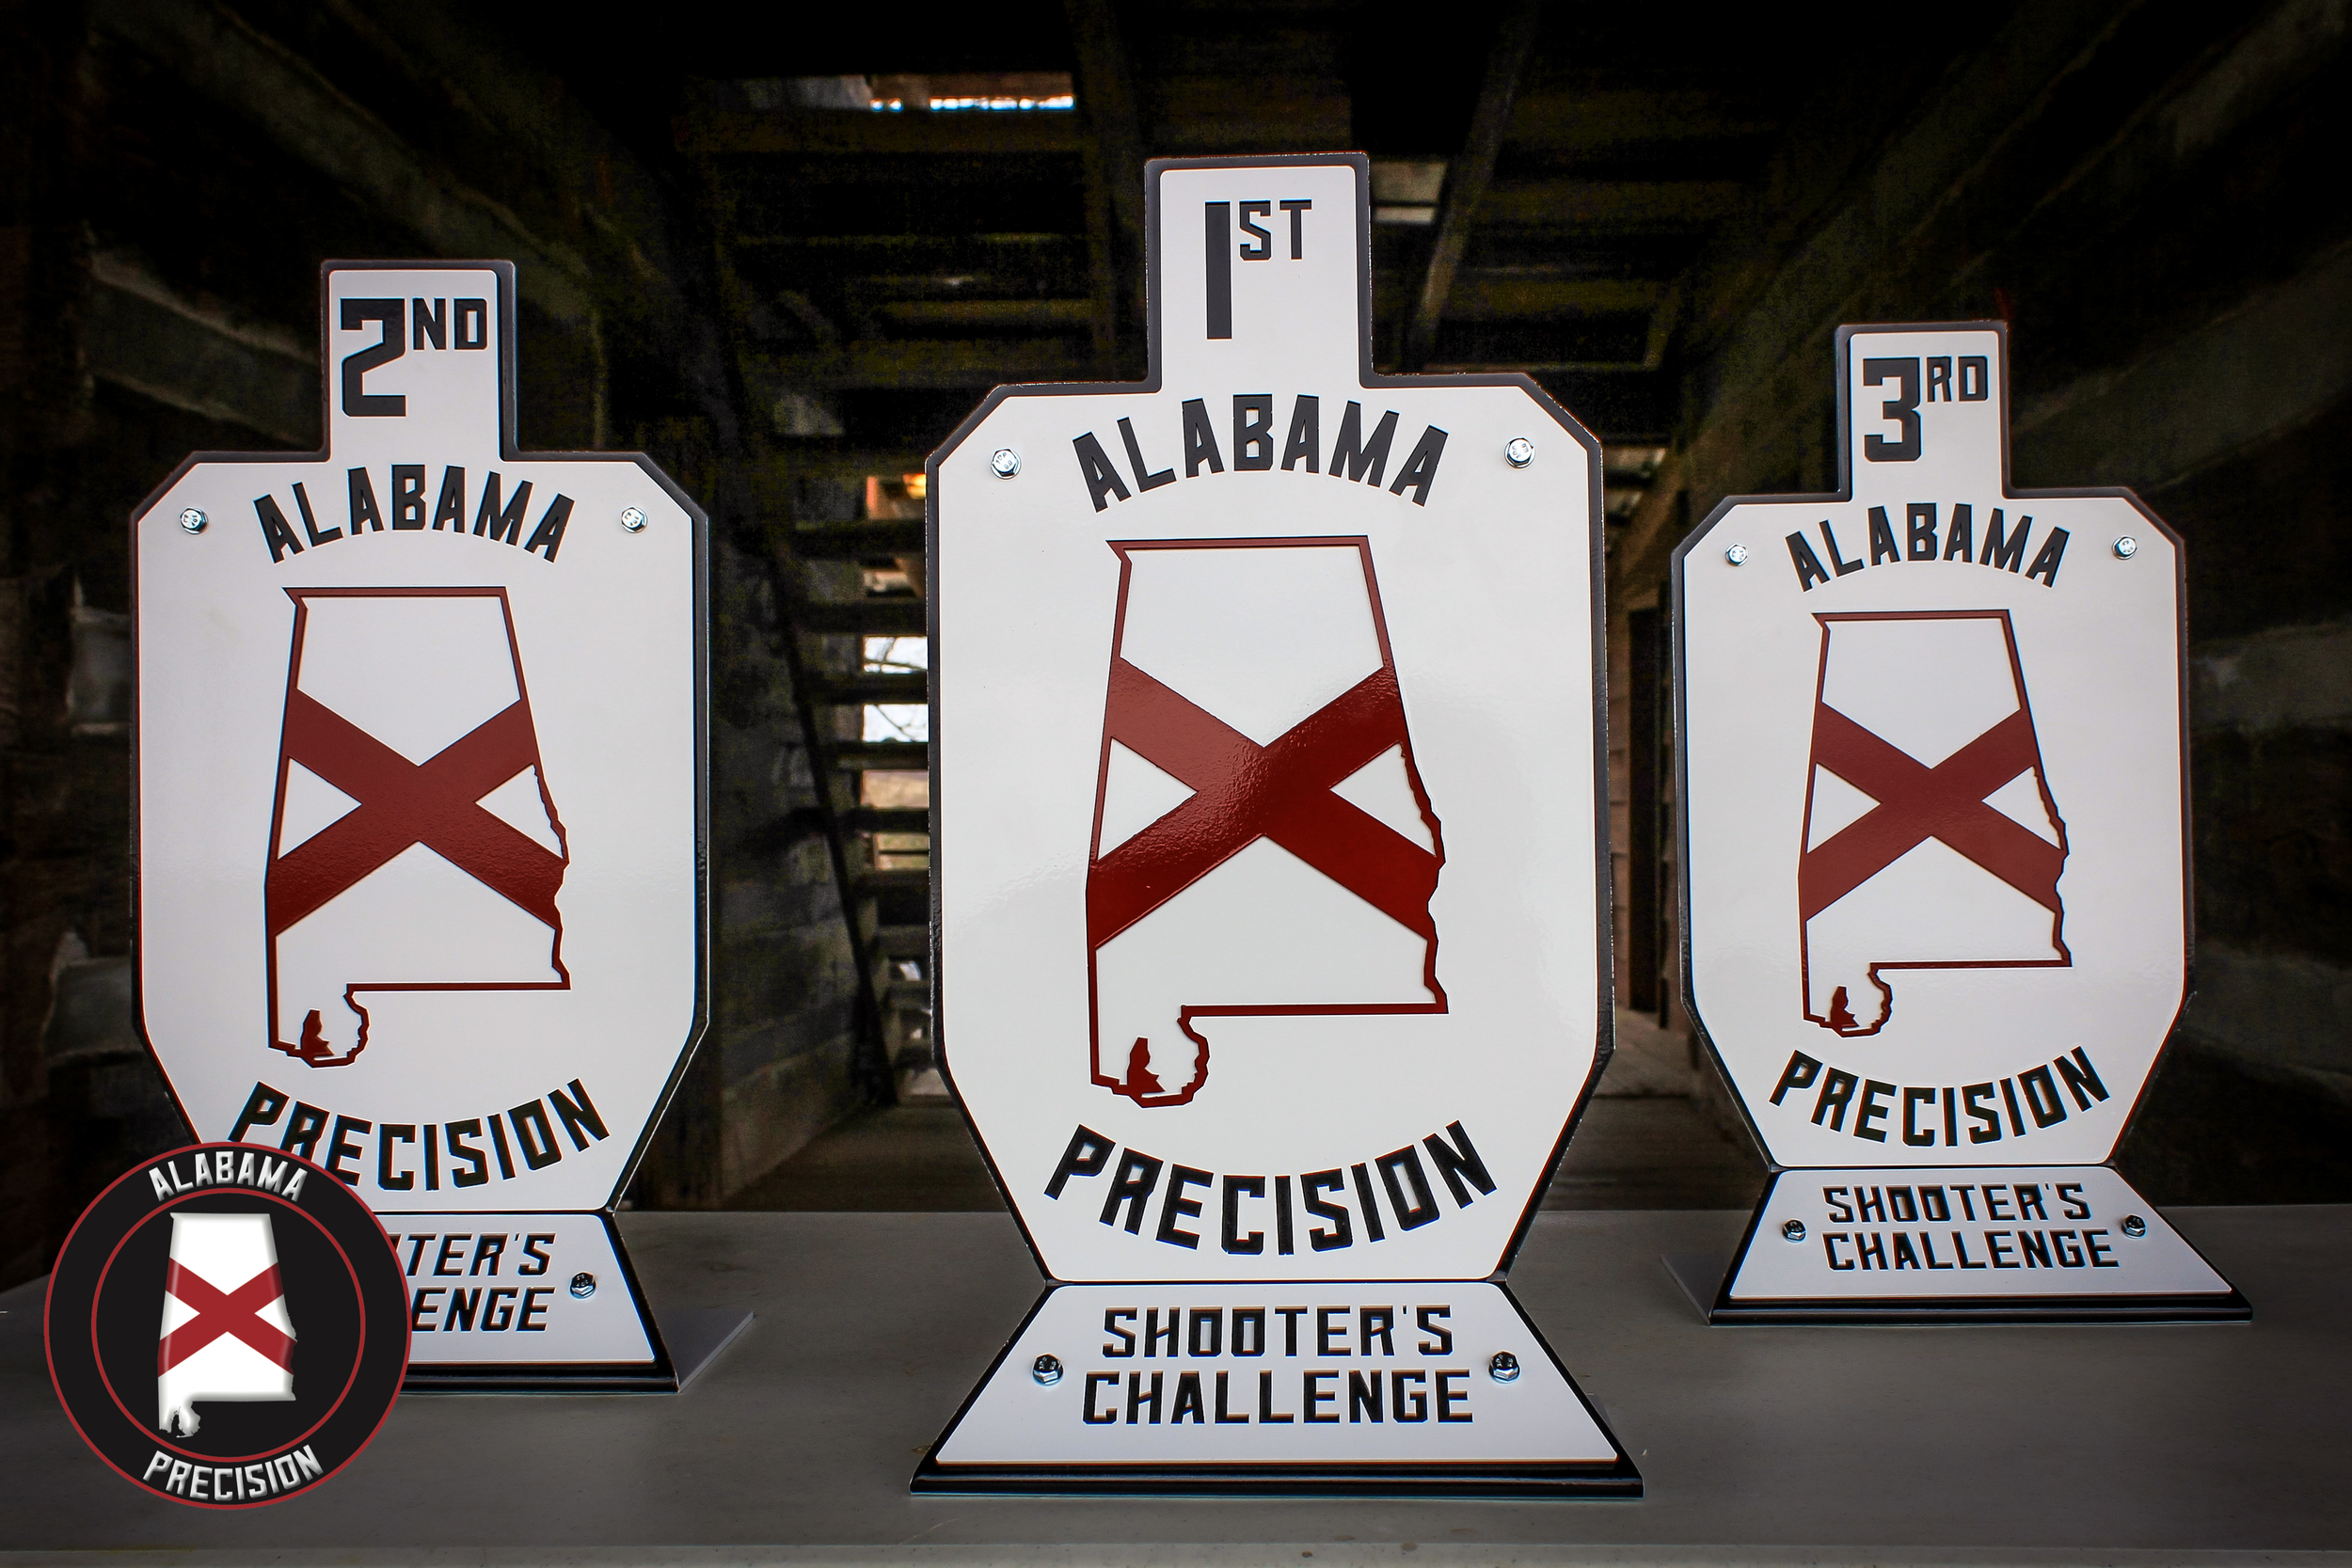 2016-02 Alabama Precision -72.jpg